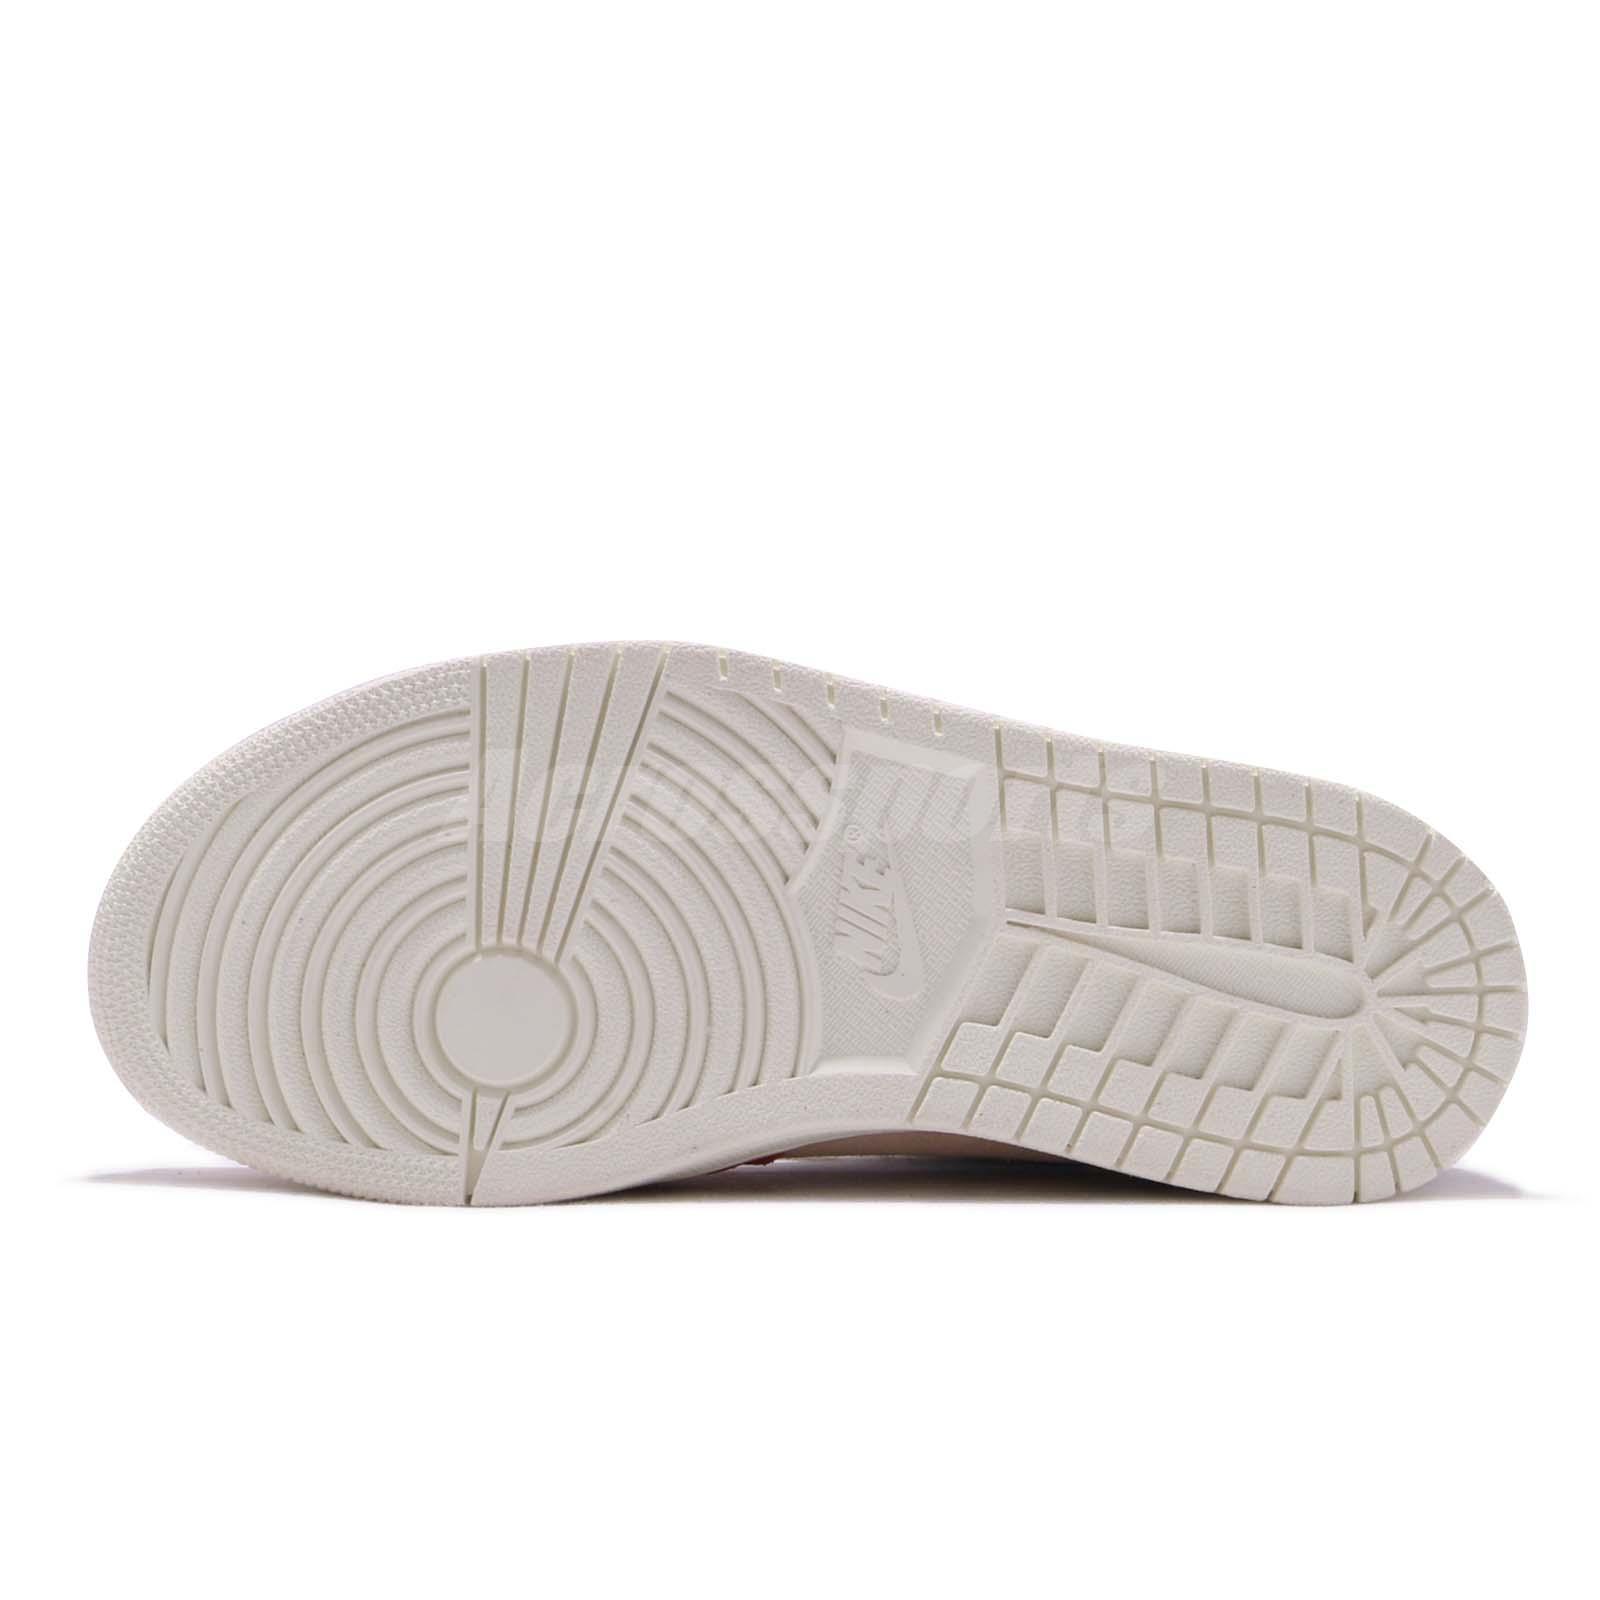 7d8bd4a728e7 Nike Wmns Air Jordan 1 High OG NRG Court Lux Aleali May Viotech ...